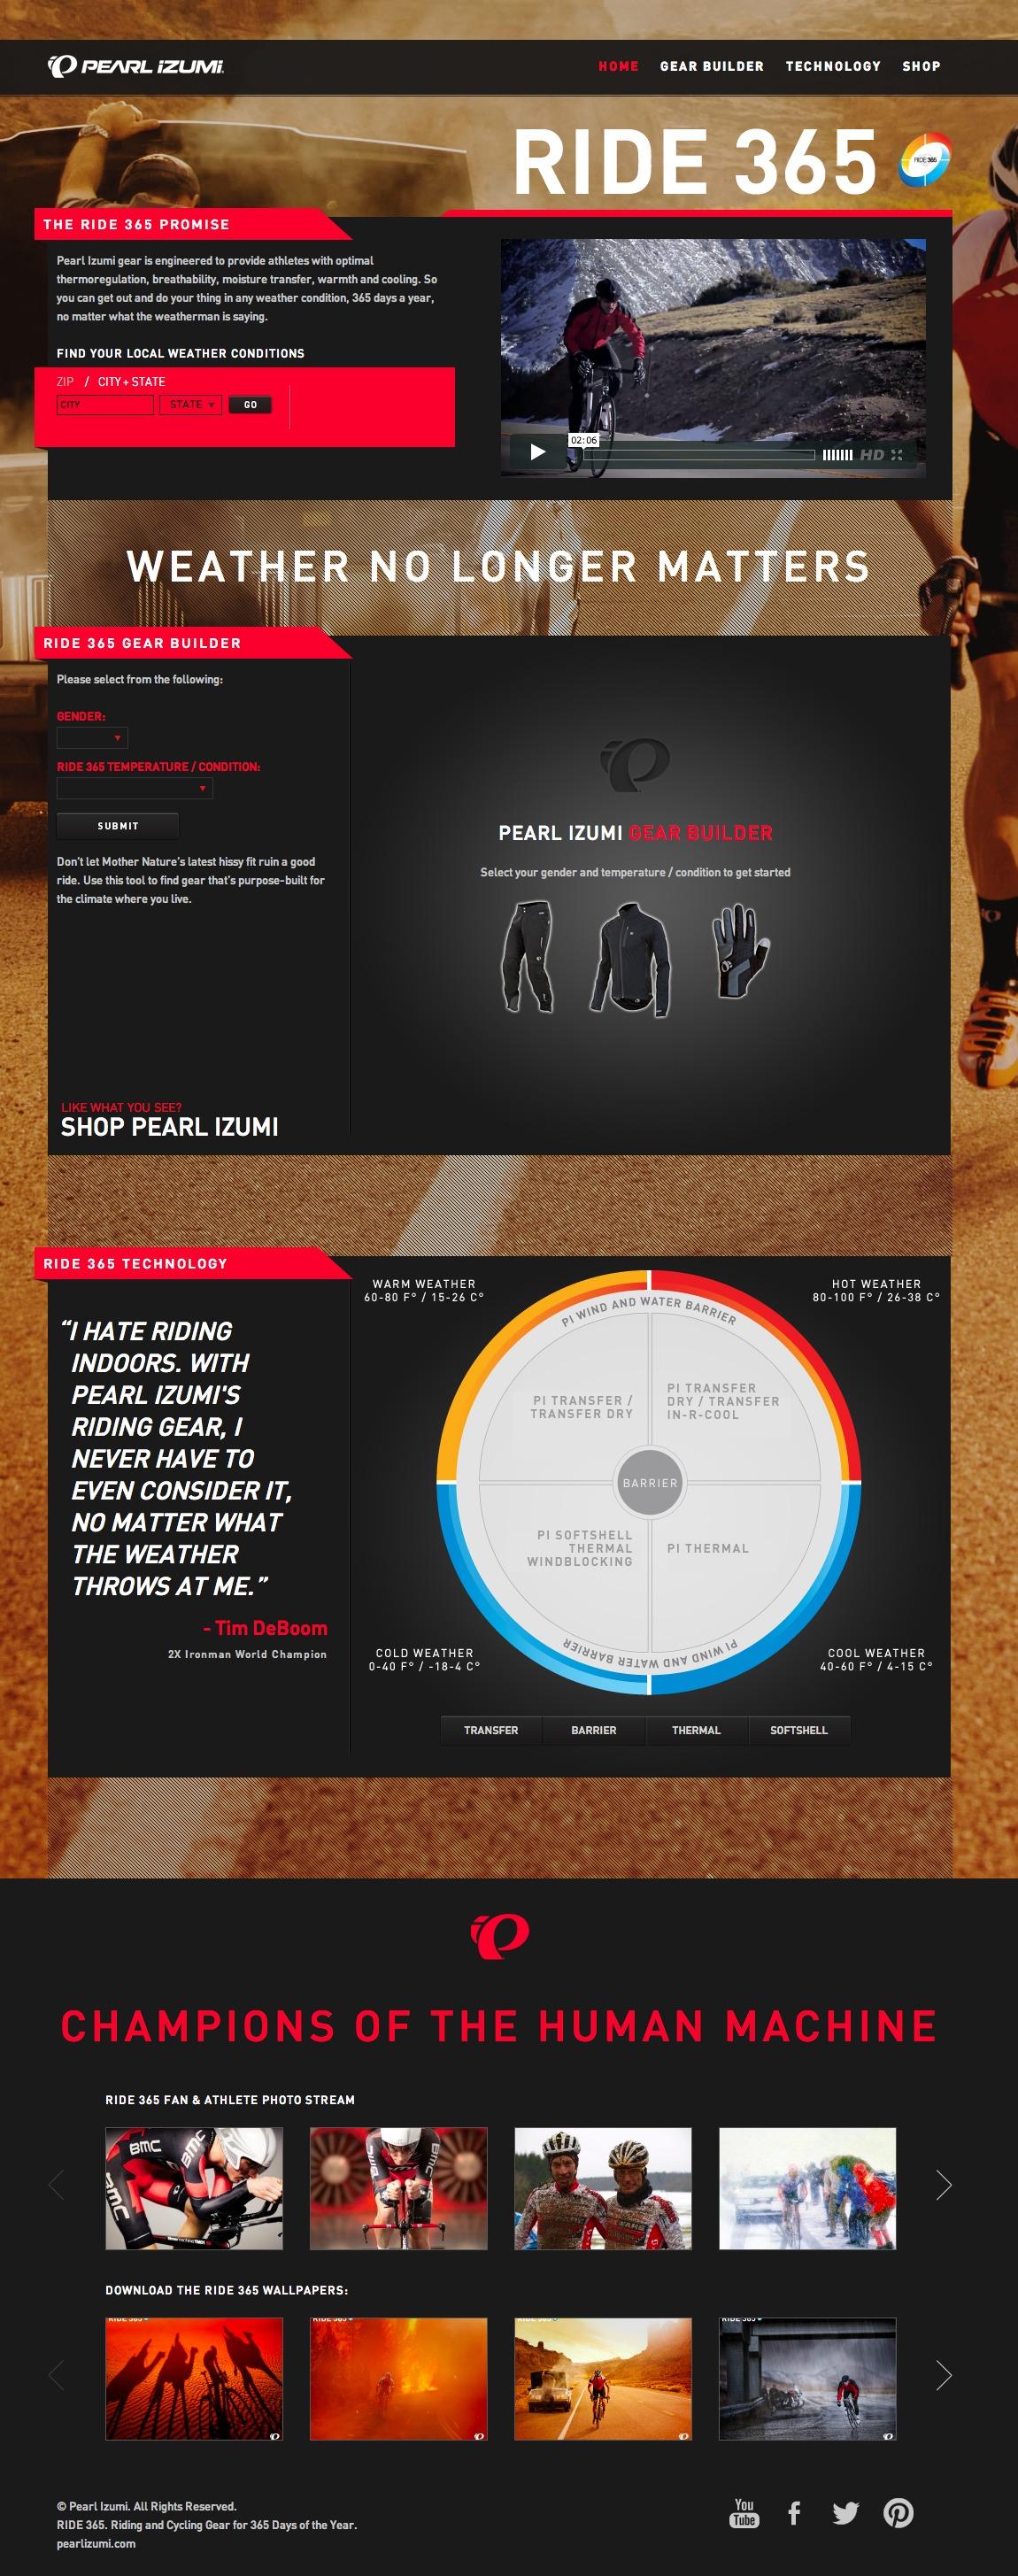 Pearl Izumi / Ride 365 Website Screenshot